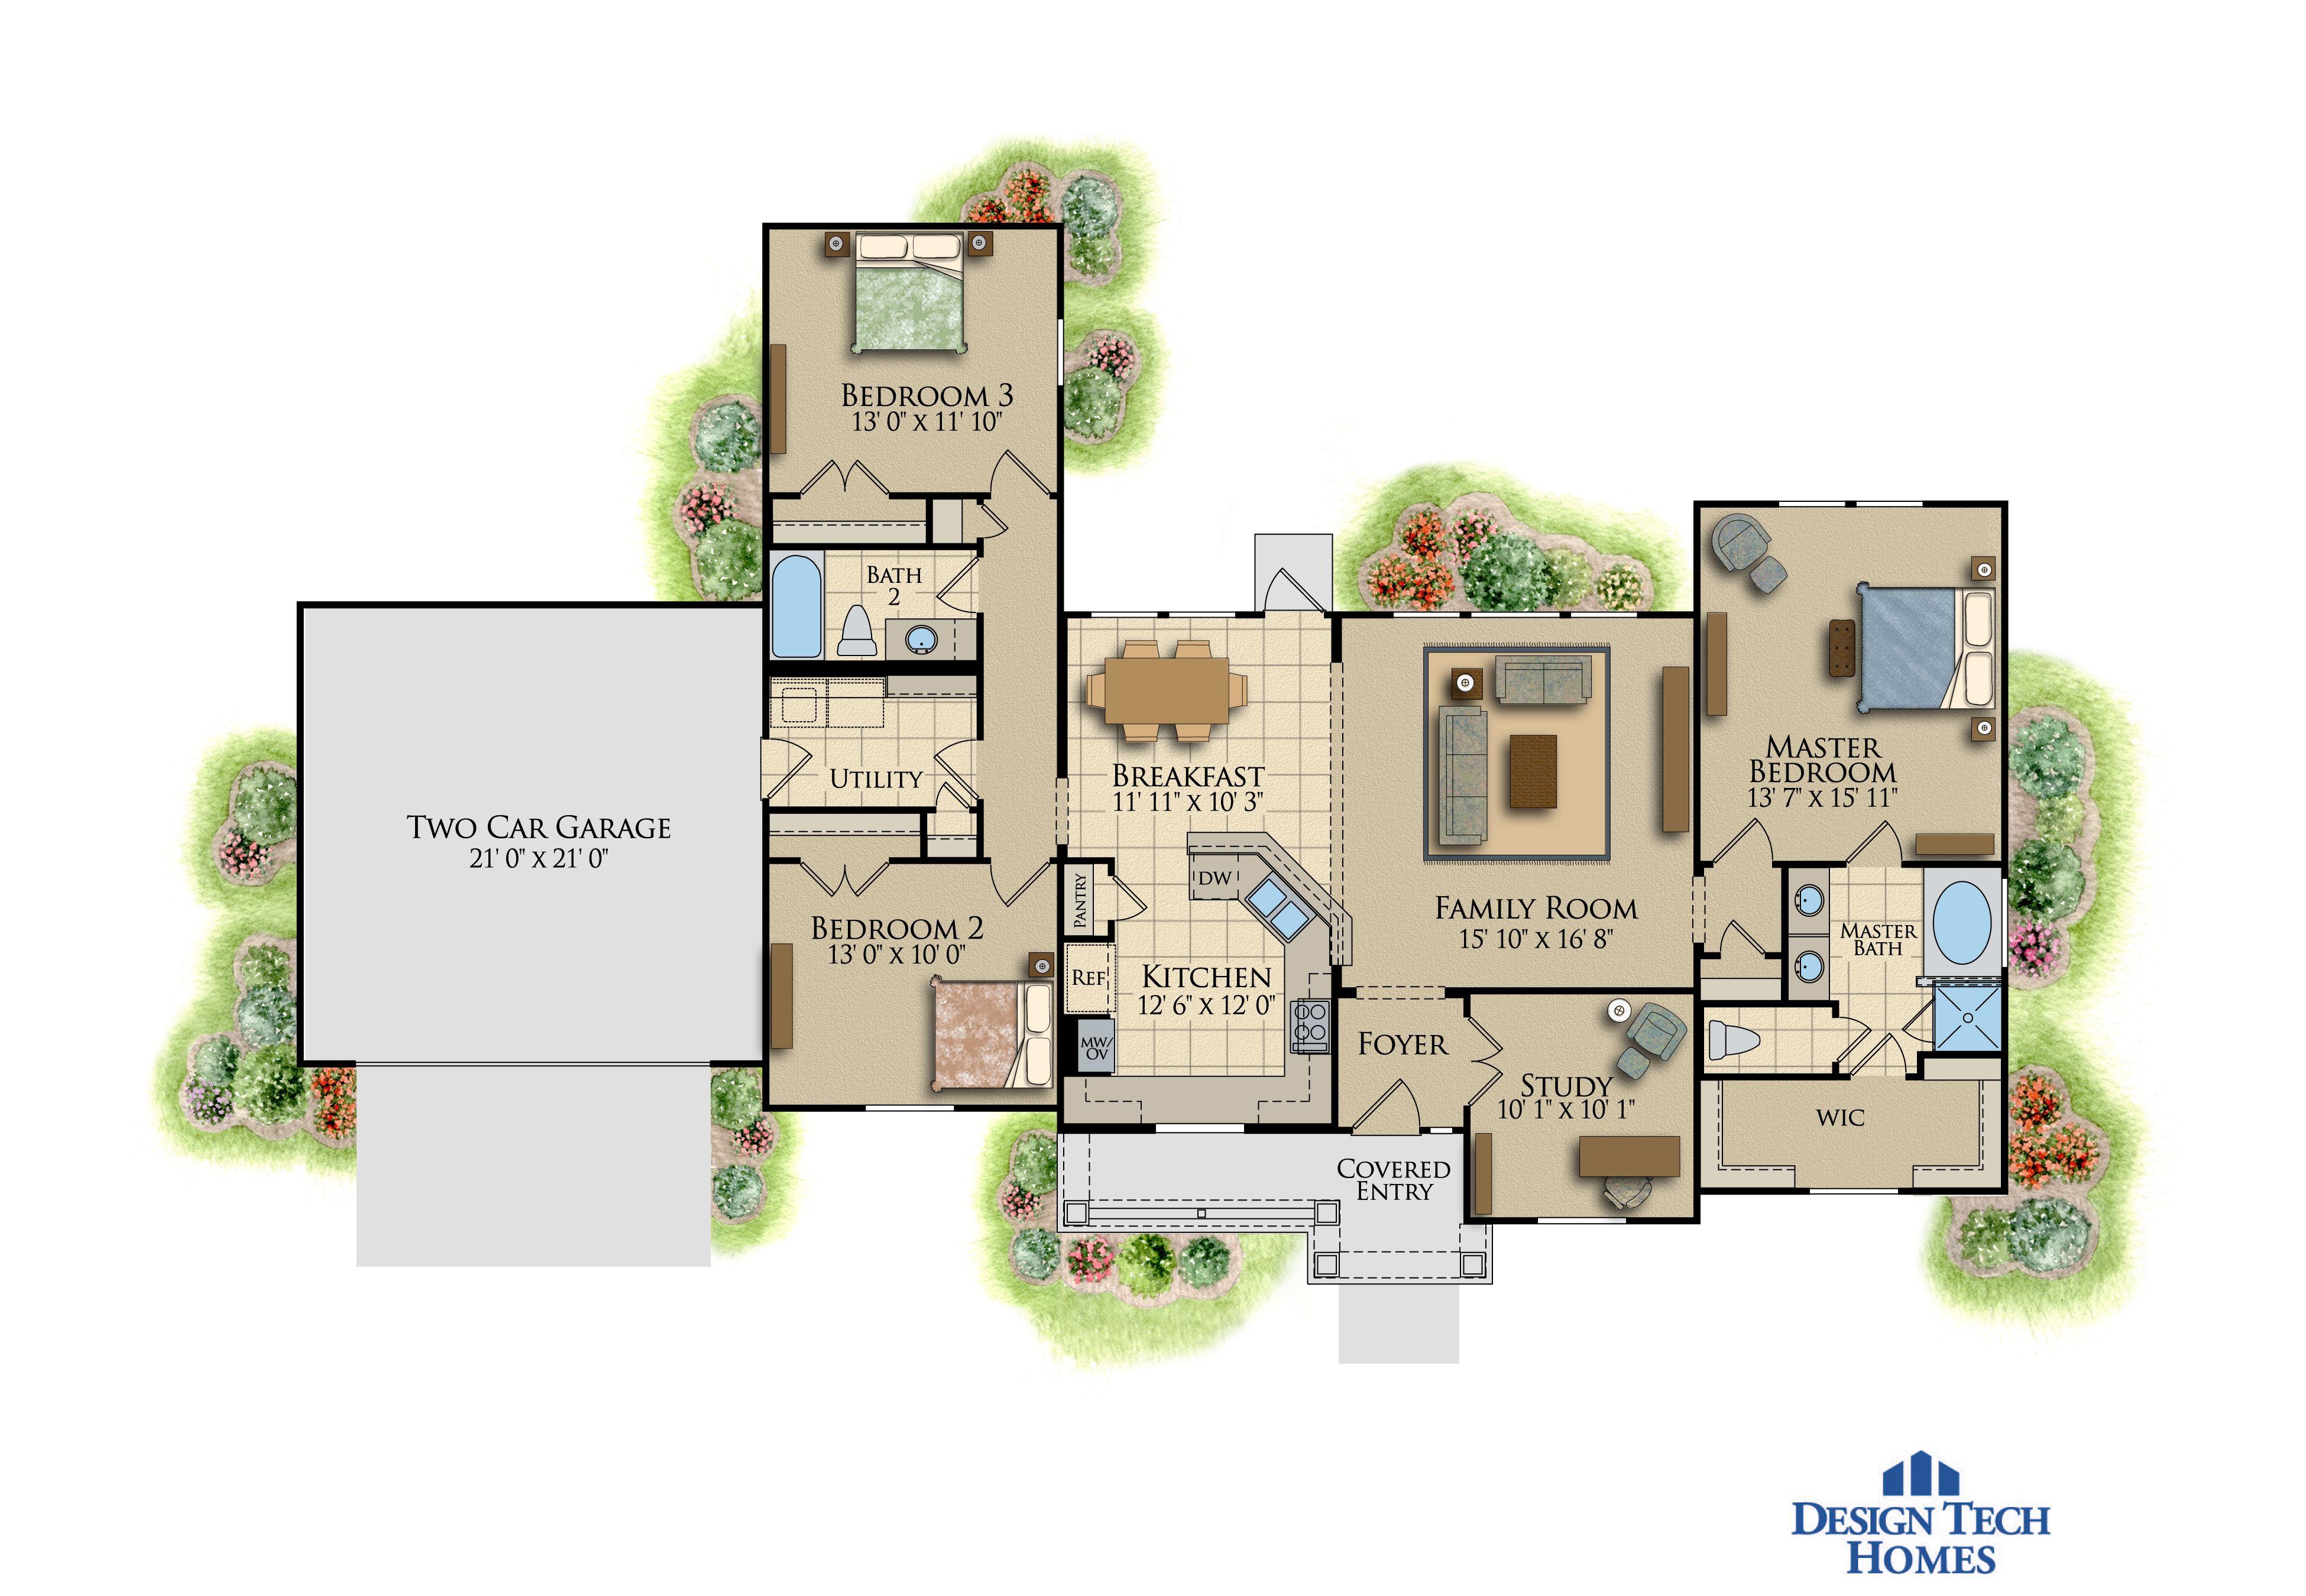 The Summerhill   Sq Ft Custom House Plans Design Tech Homes - Design tech homes pricing